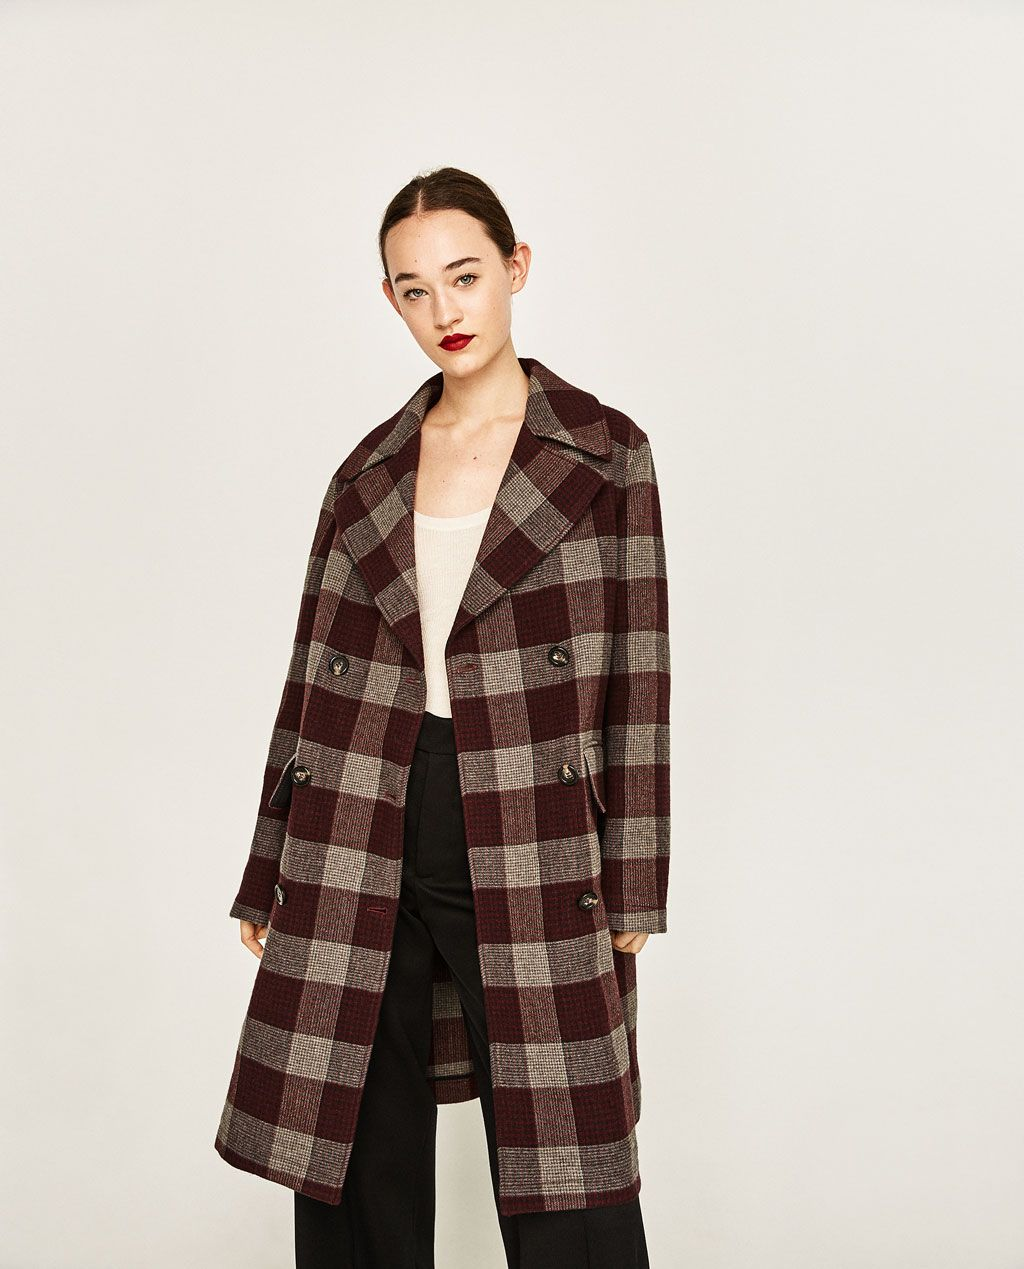 Abrigo Gris Gris Mujer Zara Mujer Cuadros Zara Abrigo Cuadros OE1xgx